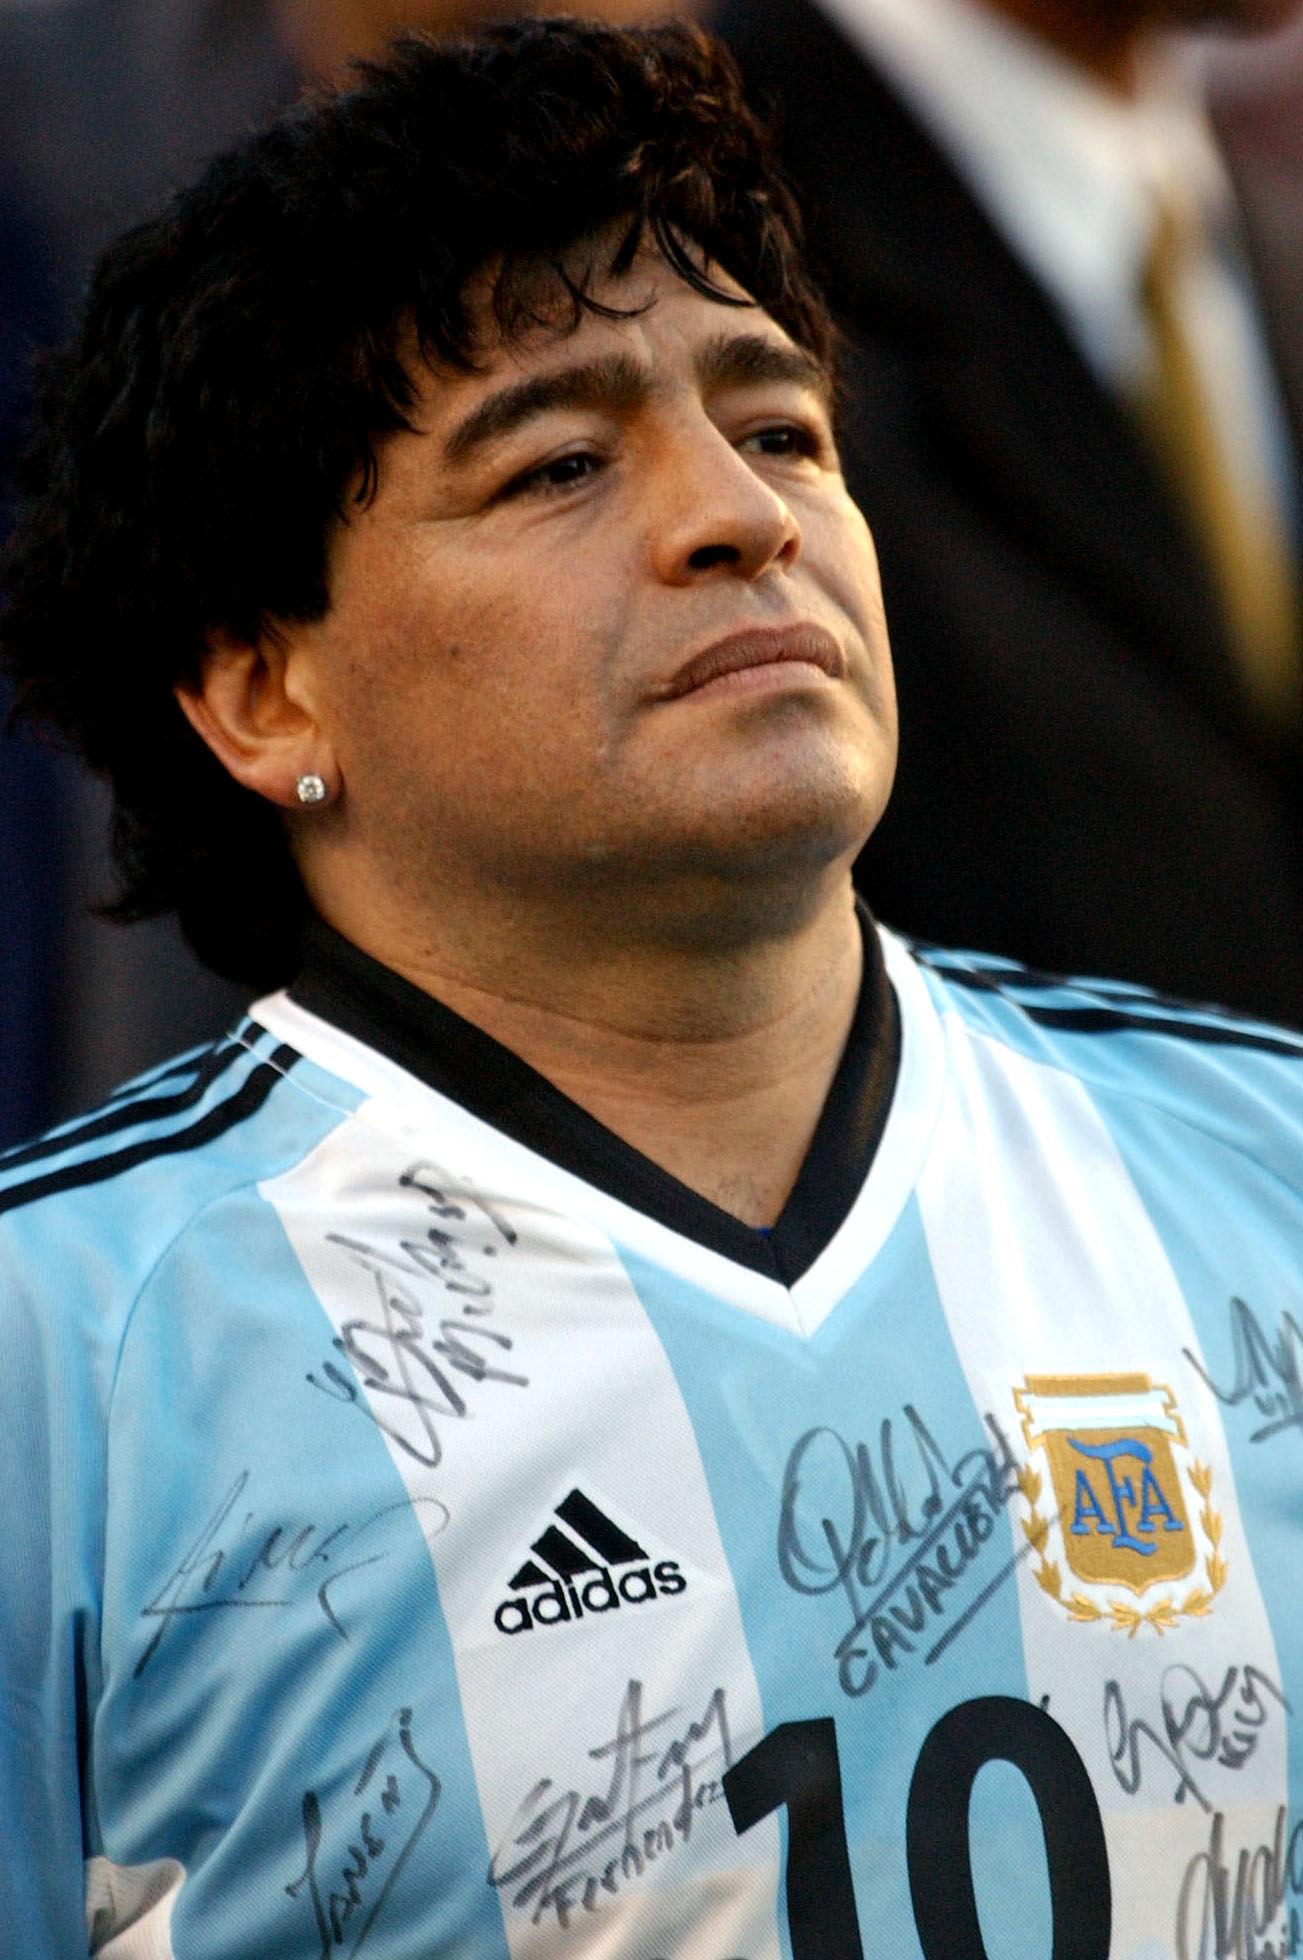 Символ футбола. ФОТО галерея памяти Диего Марадоны - фото 3